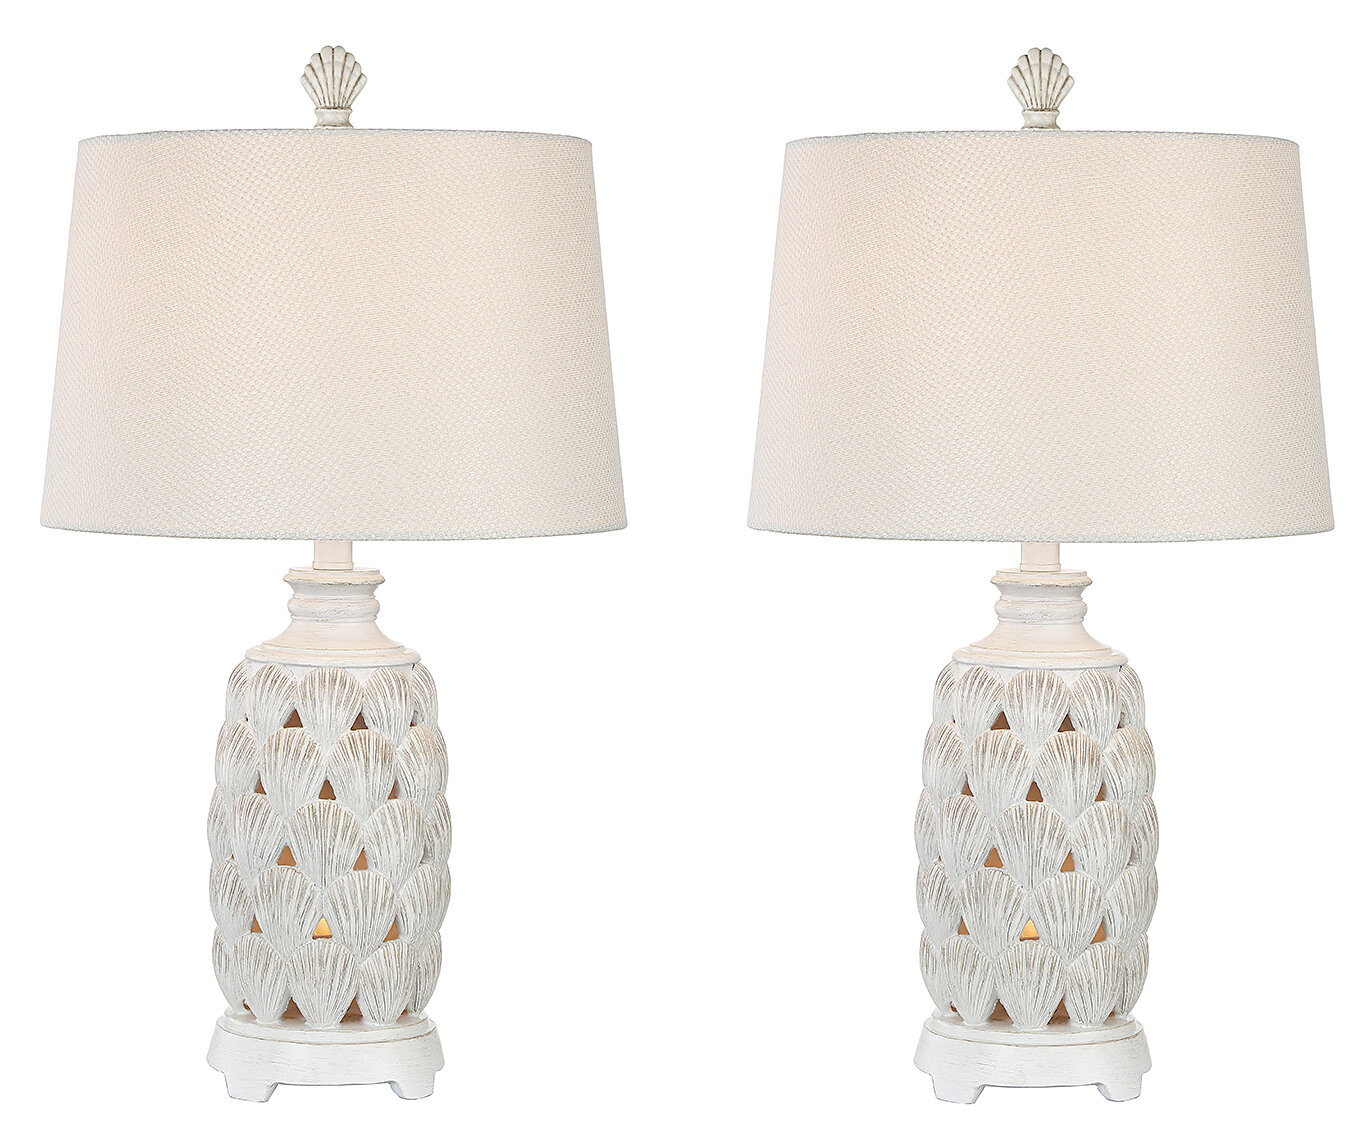 Resendez shell coastal 25 table lamp